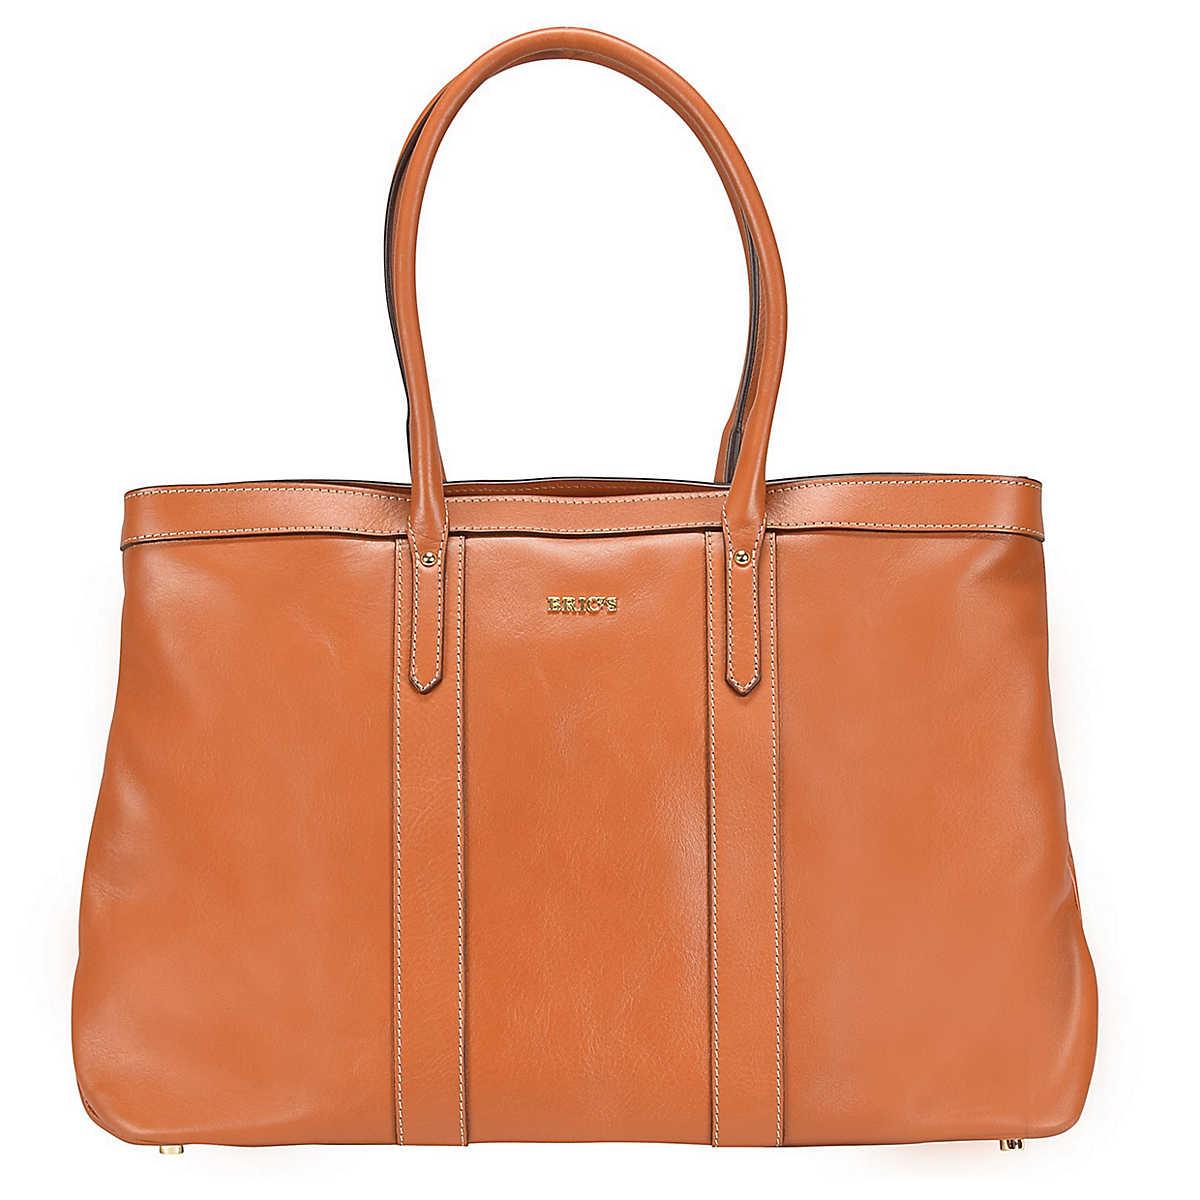 Bric�´s Life Pelle Shopper Tasche Leder 43 cm braun - Bric�´s - Shopper - Taschen - mirapodo.de